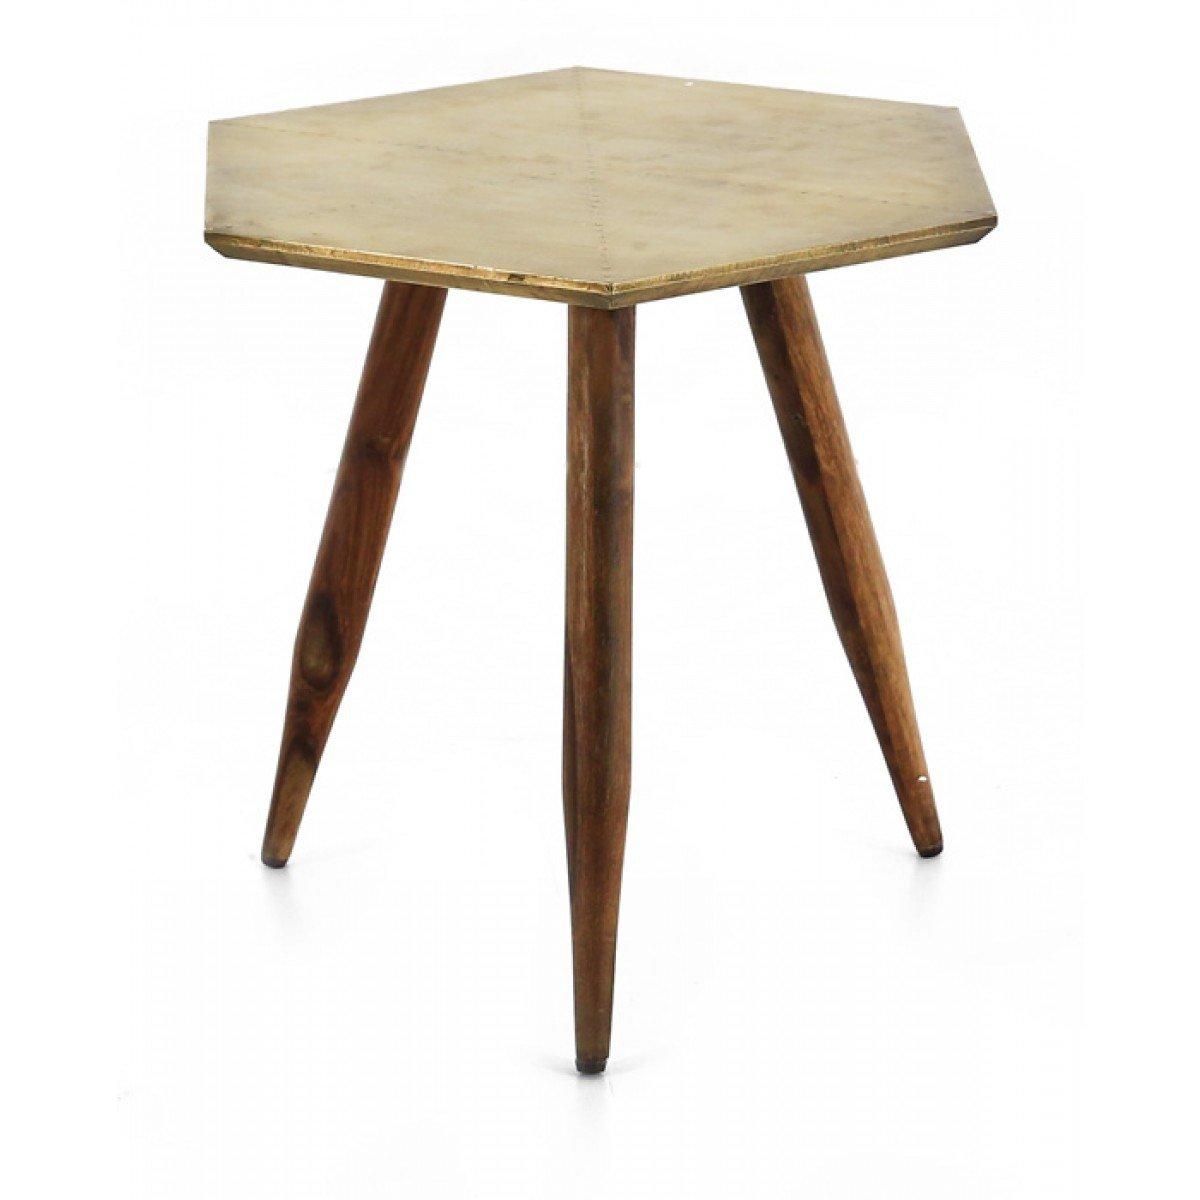 Delamaison Coppen Tisch, mehrfarbig